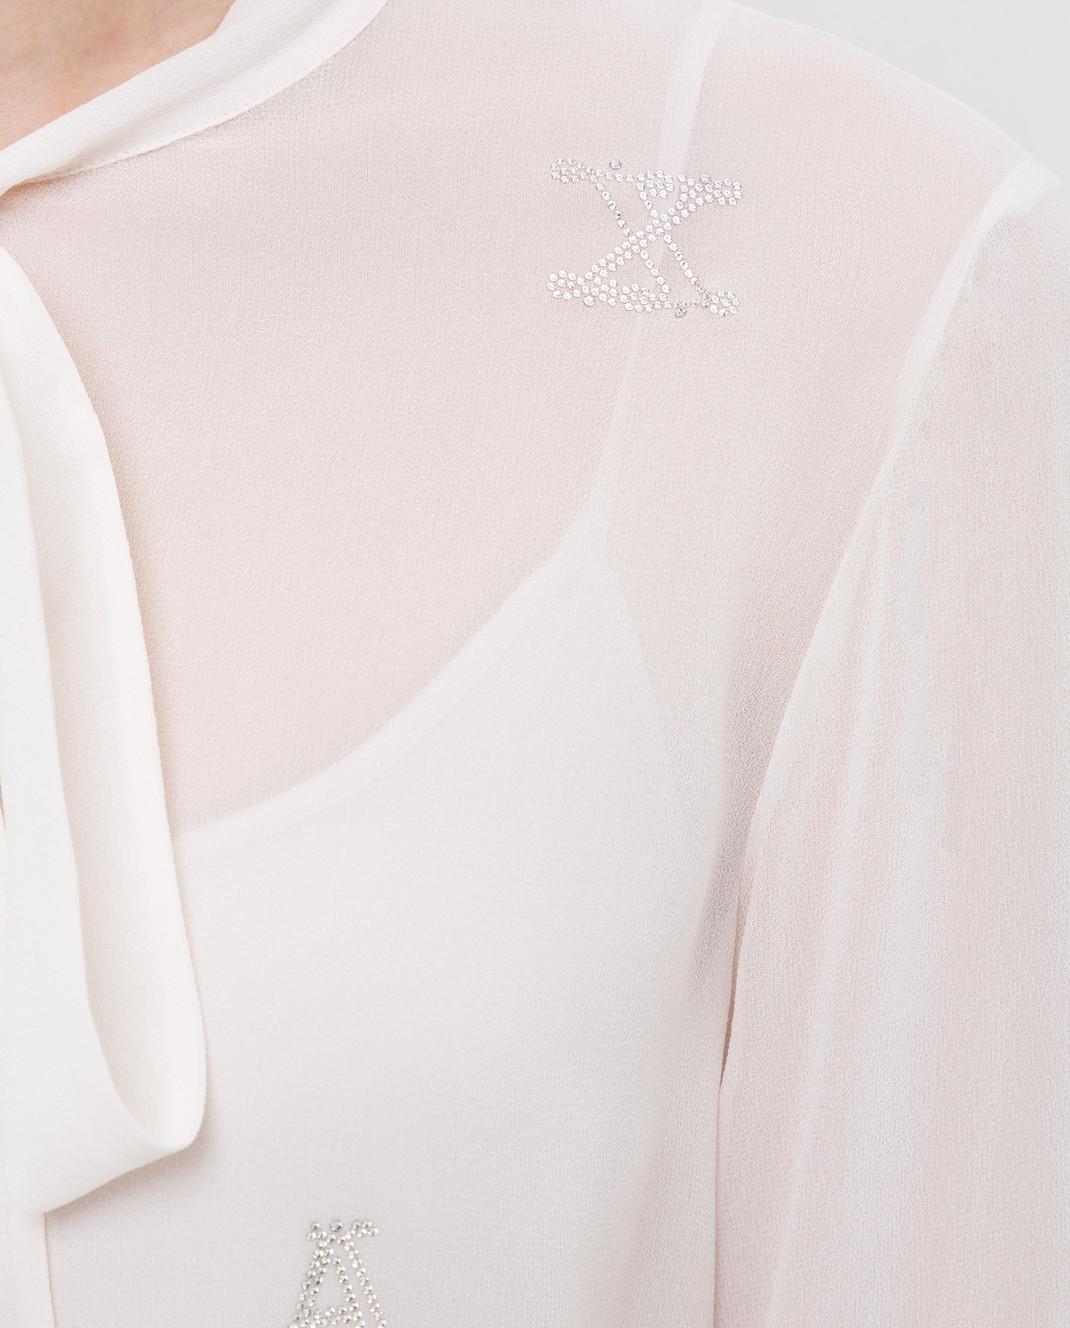 Max Mara Светло-бежевая блуза из шелка NUVOLE изображение 5